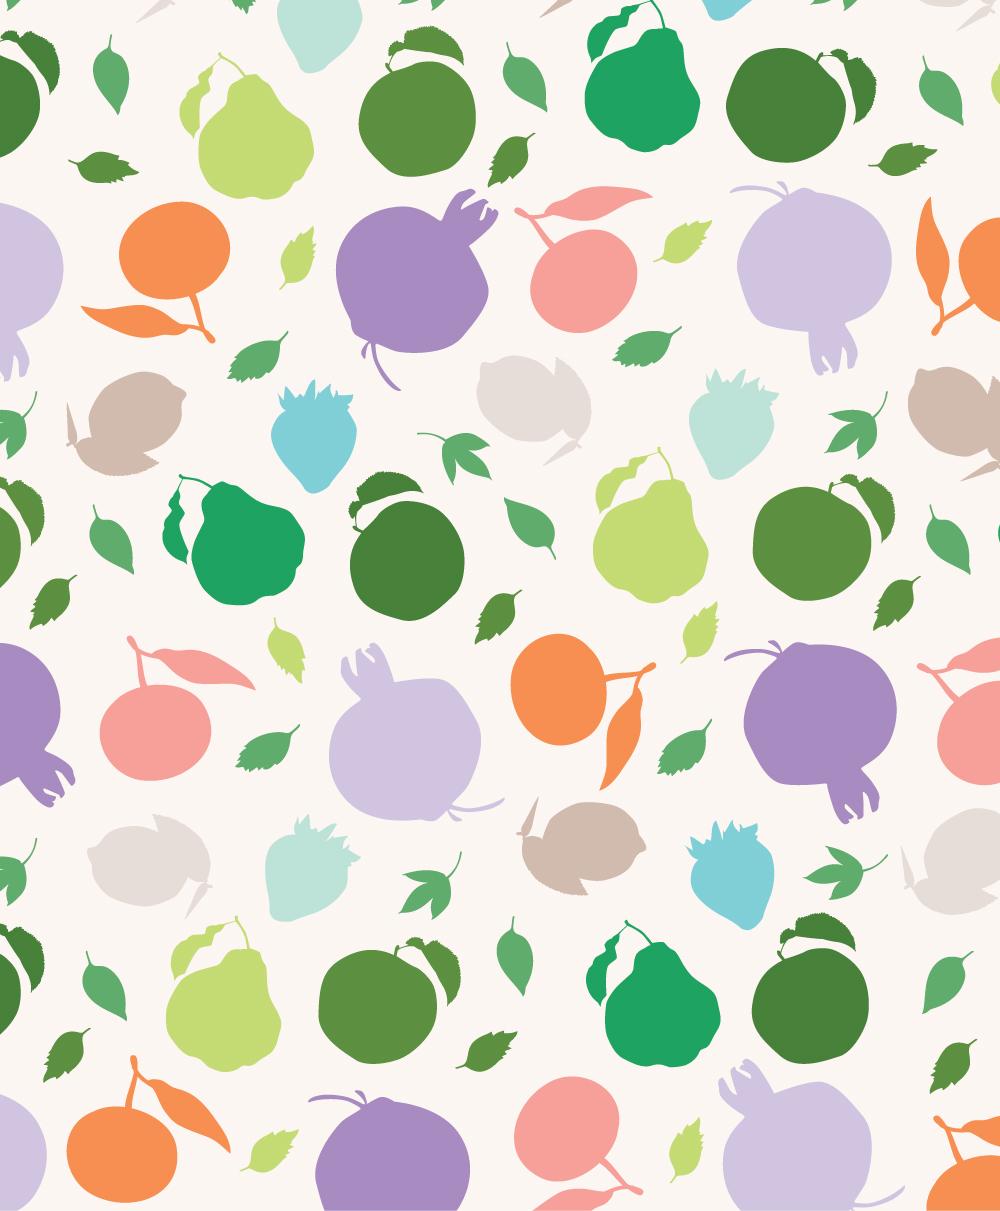 justbenice-BioMio-pattern-6.jpg